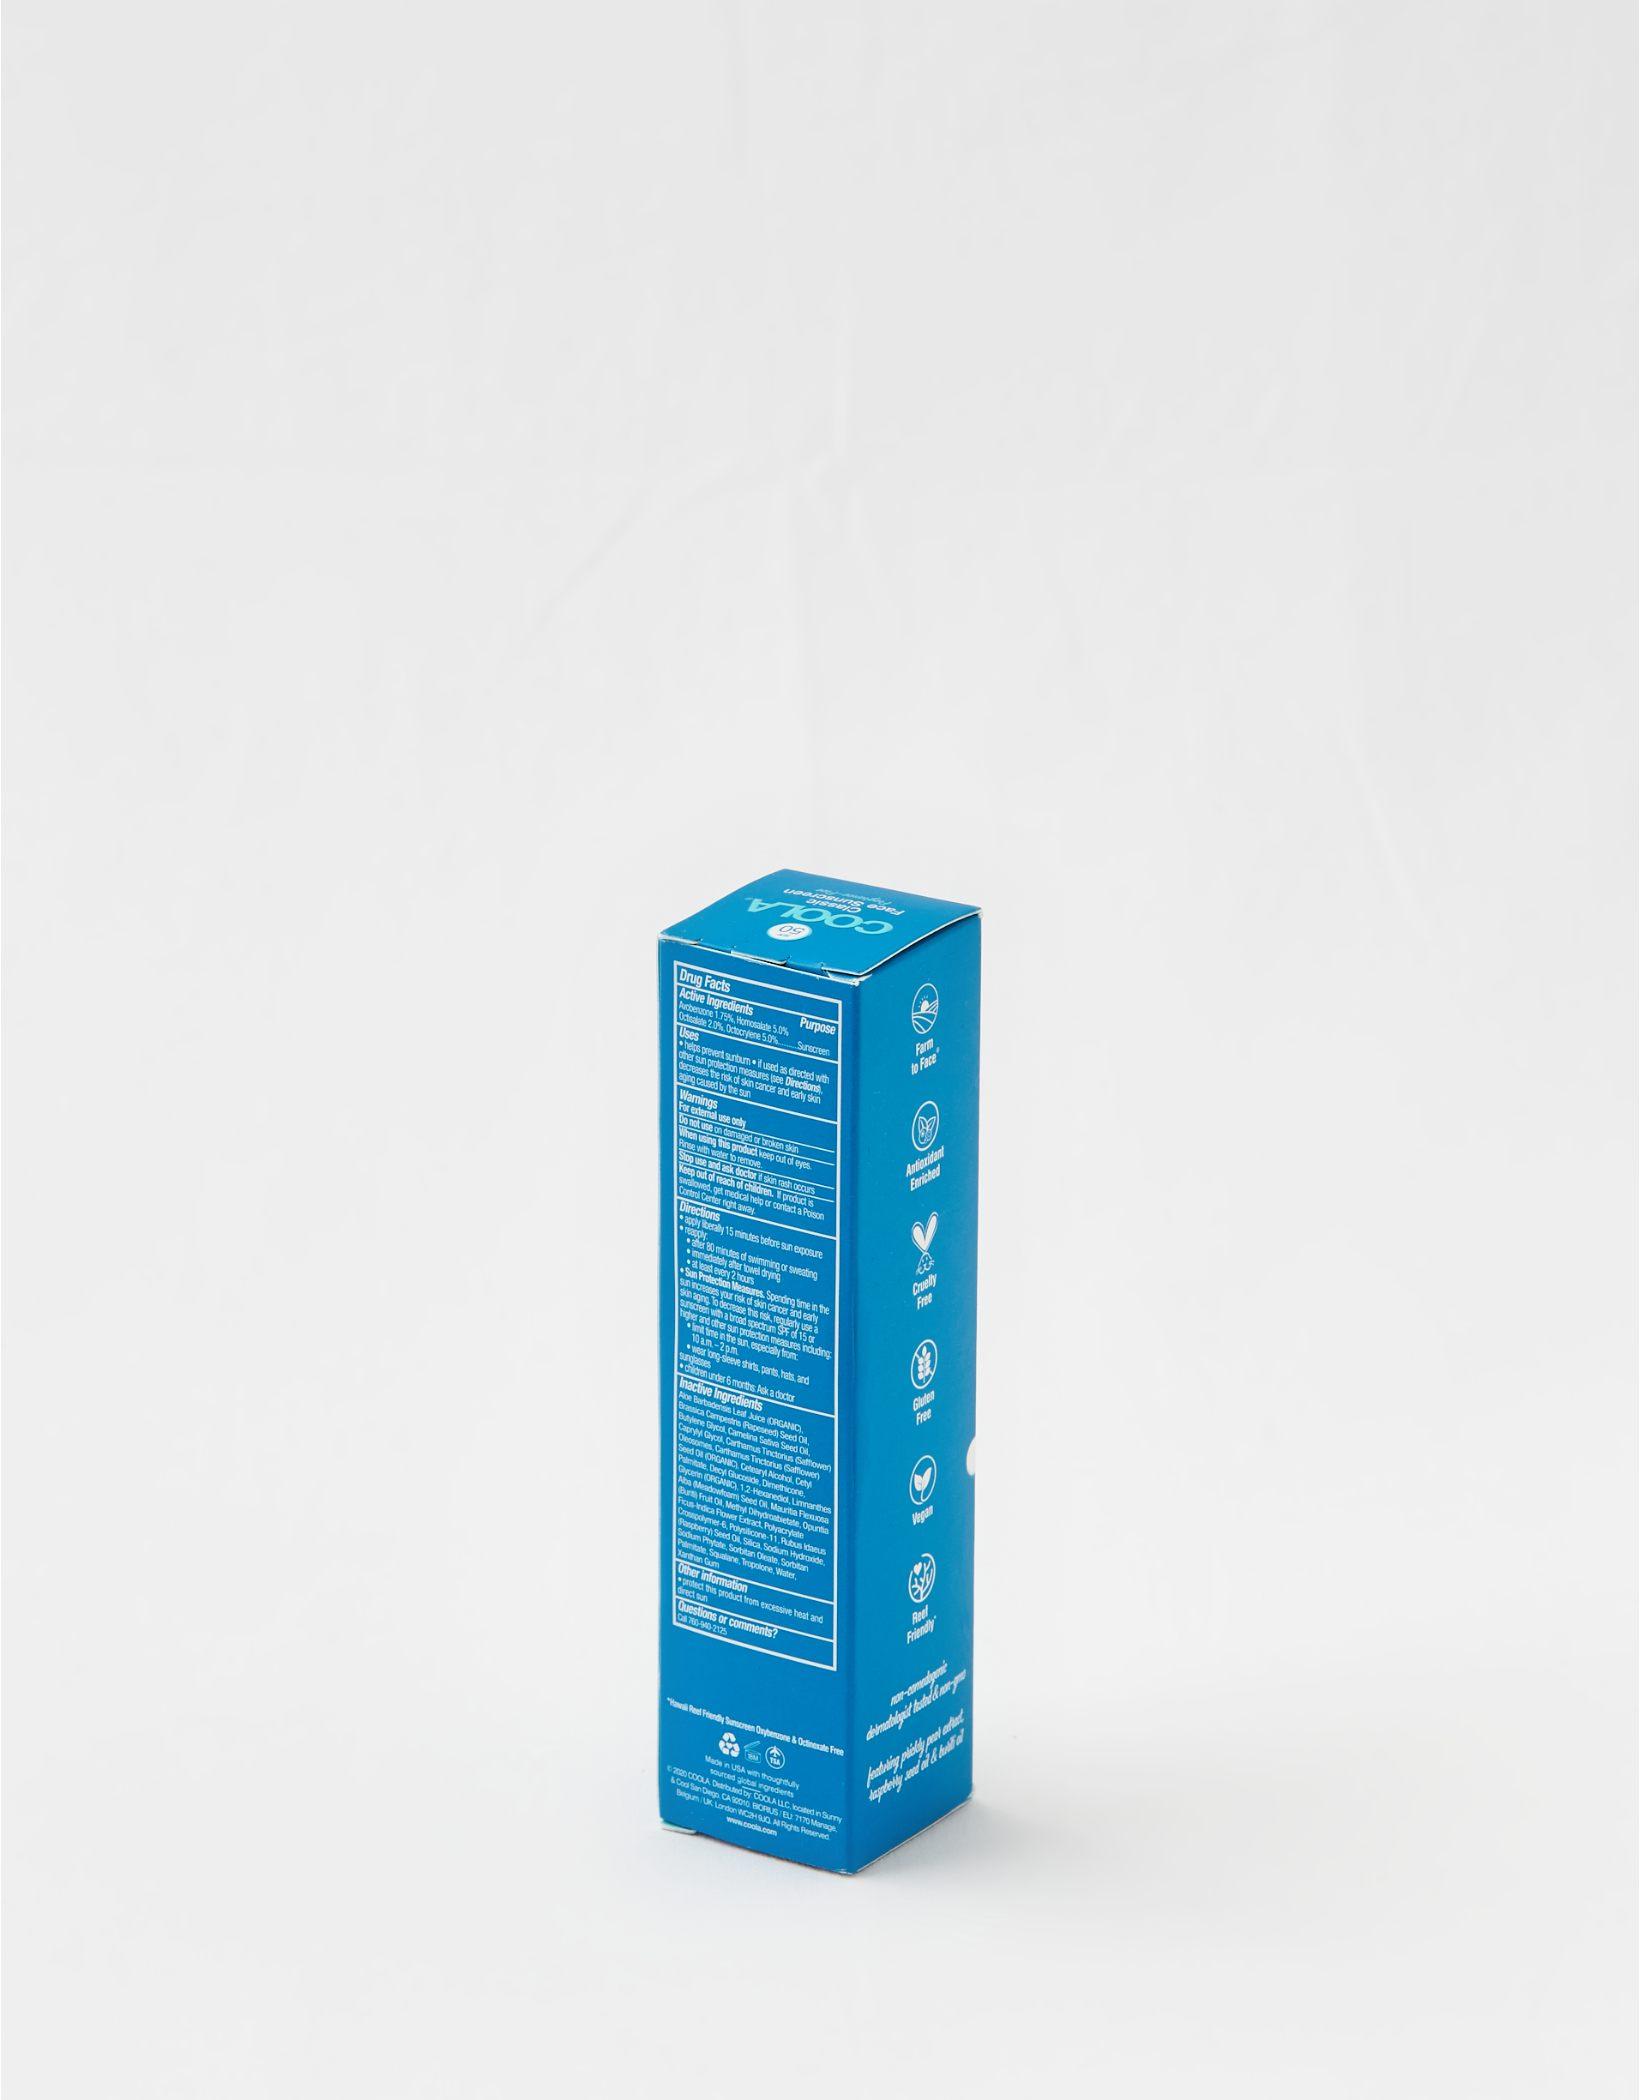 Coola Classic Face Lotion Sunscreen - SPF 30